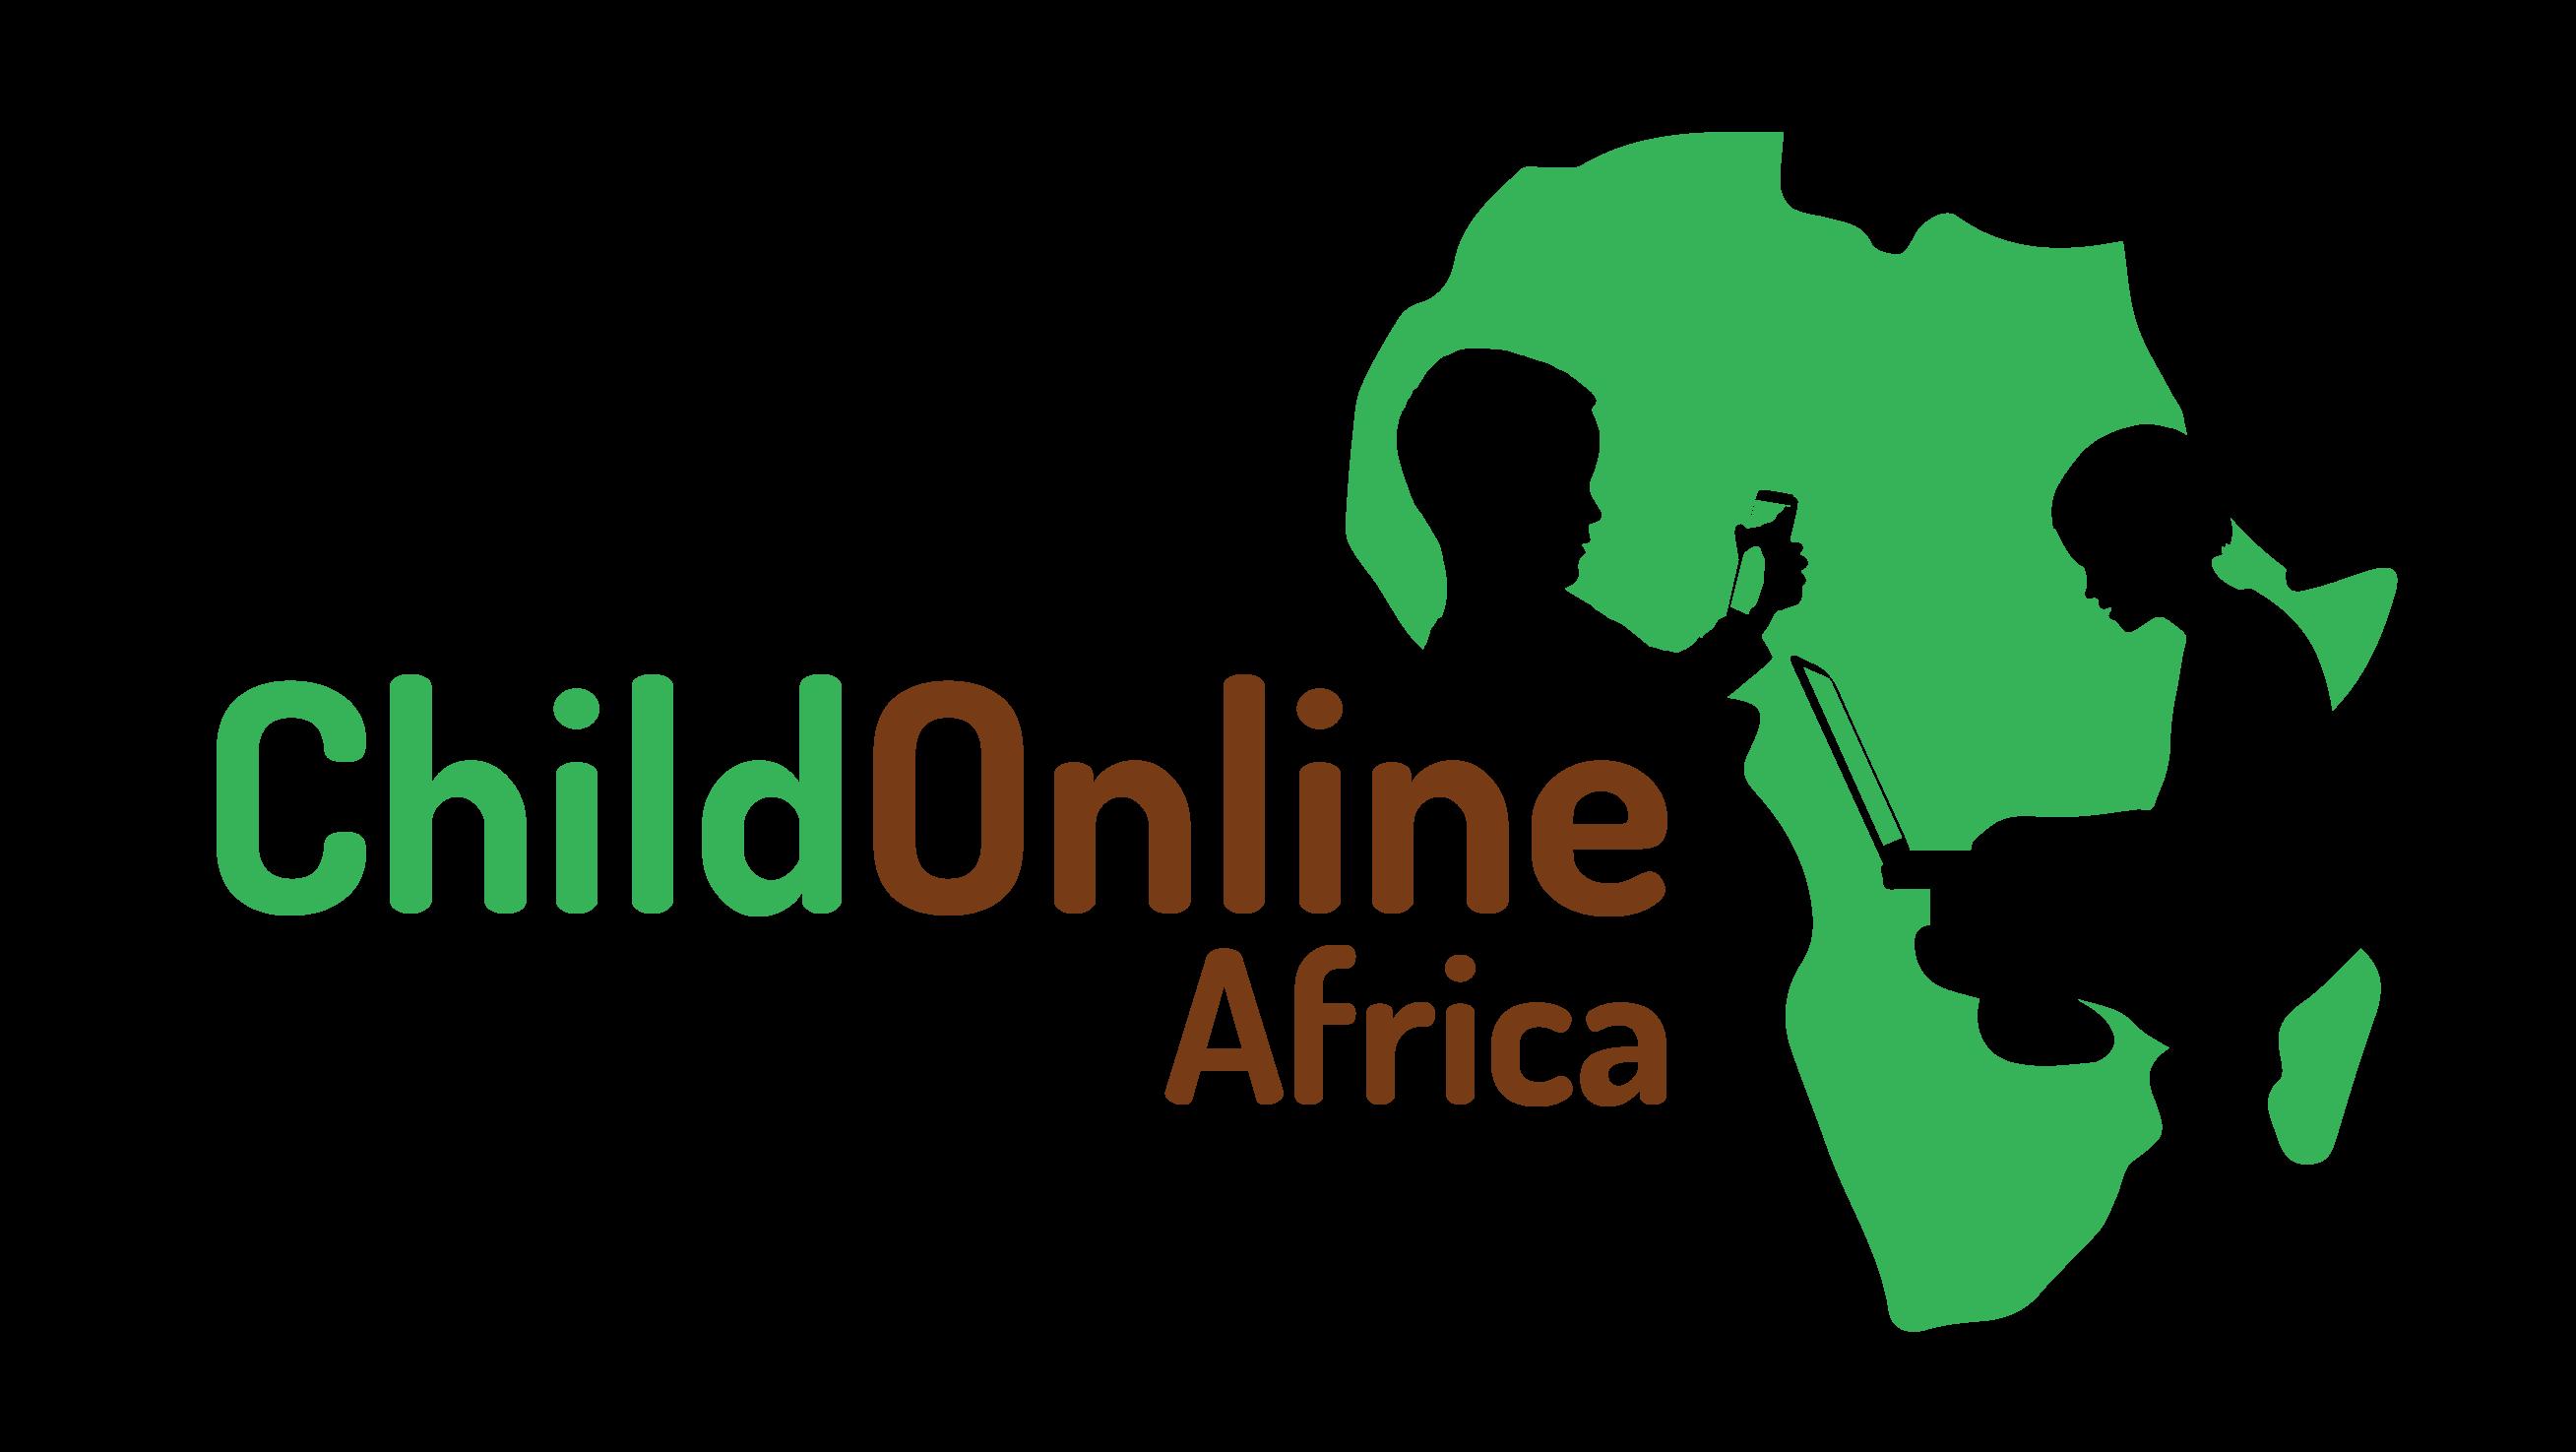 ChildOnline Africa